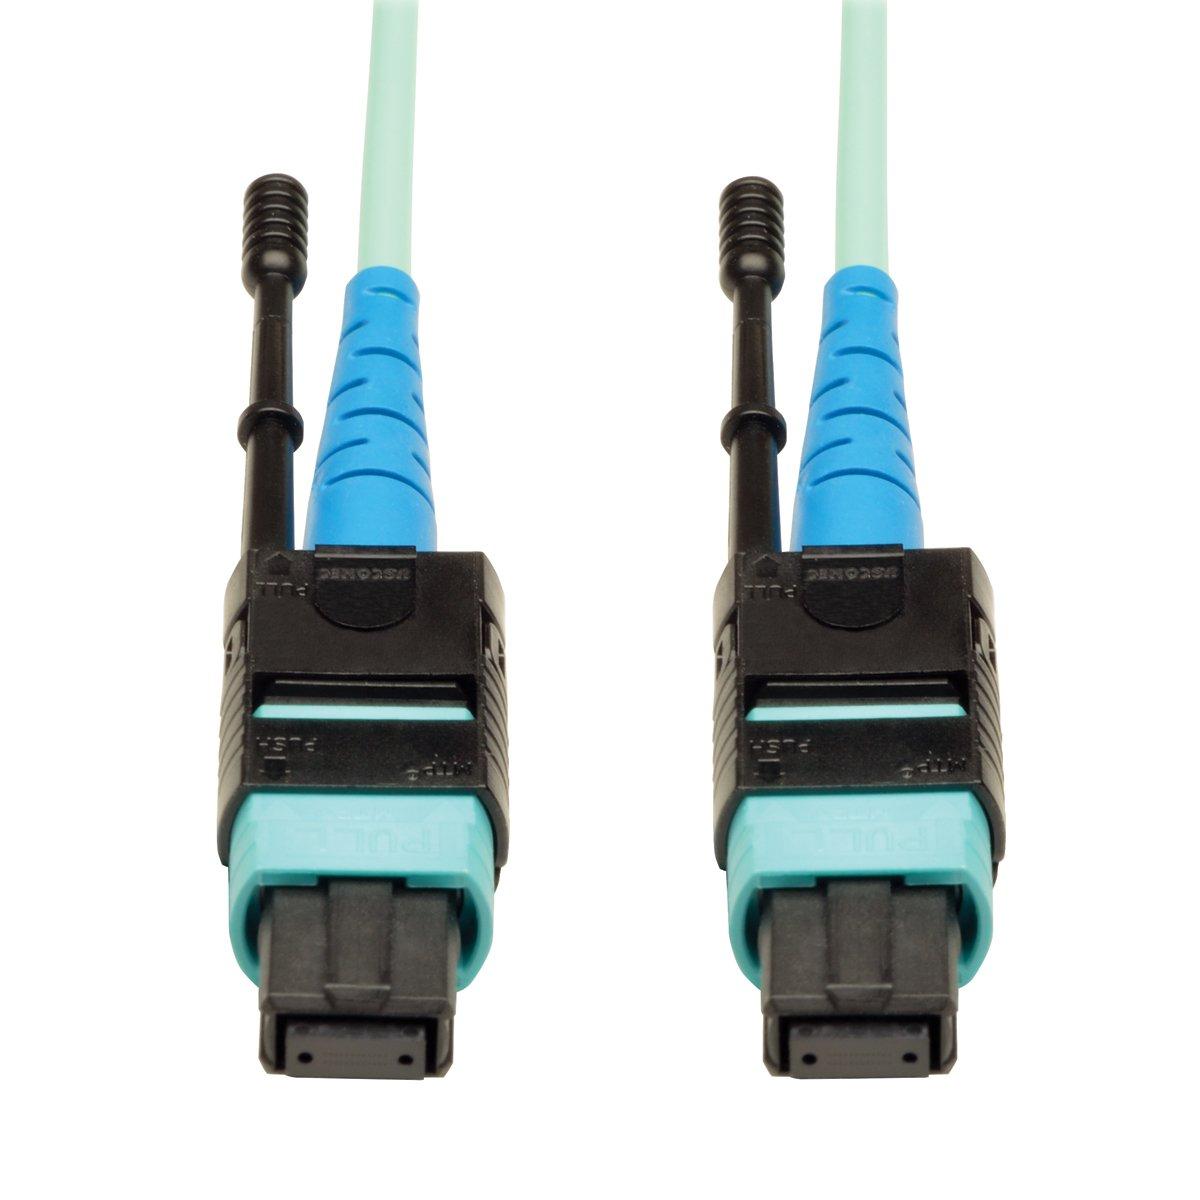 Tripp Lite MTP / MPO Patch Cable 100GBASE-SR10, CXP, 24 Fiber, 100GbE OM3 Plenum-rated - Aqua, 10M (33-ft.)(N846-10M-24-P)